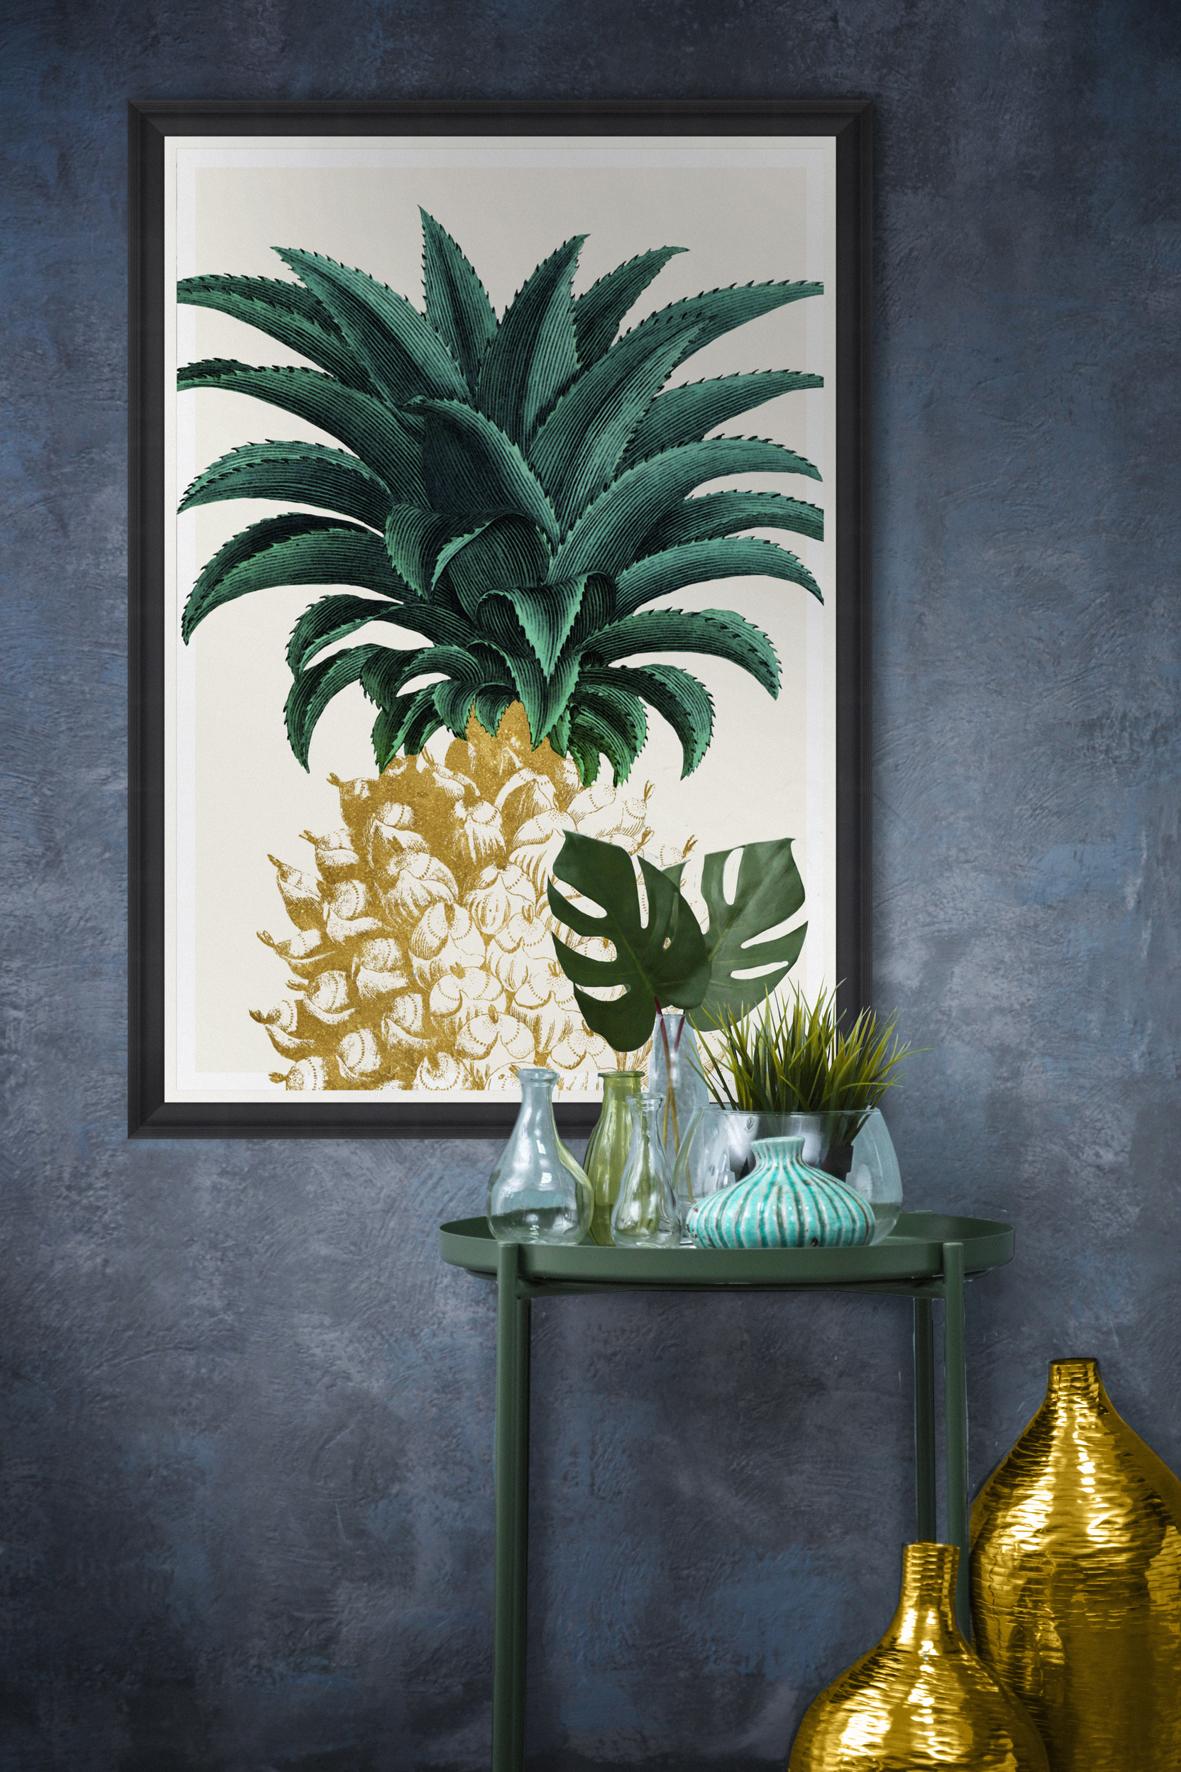 Pineapple Sweet Framed Wall Art by MINDTHEGAP.jpg